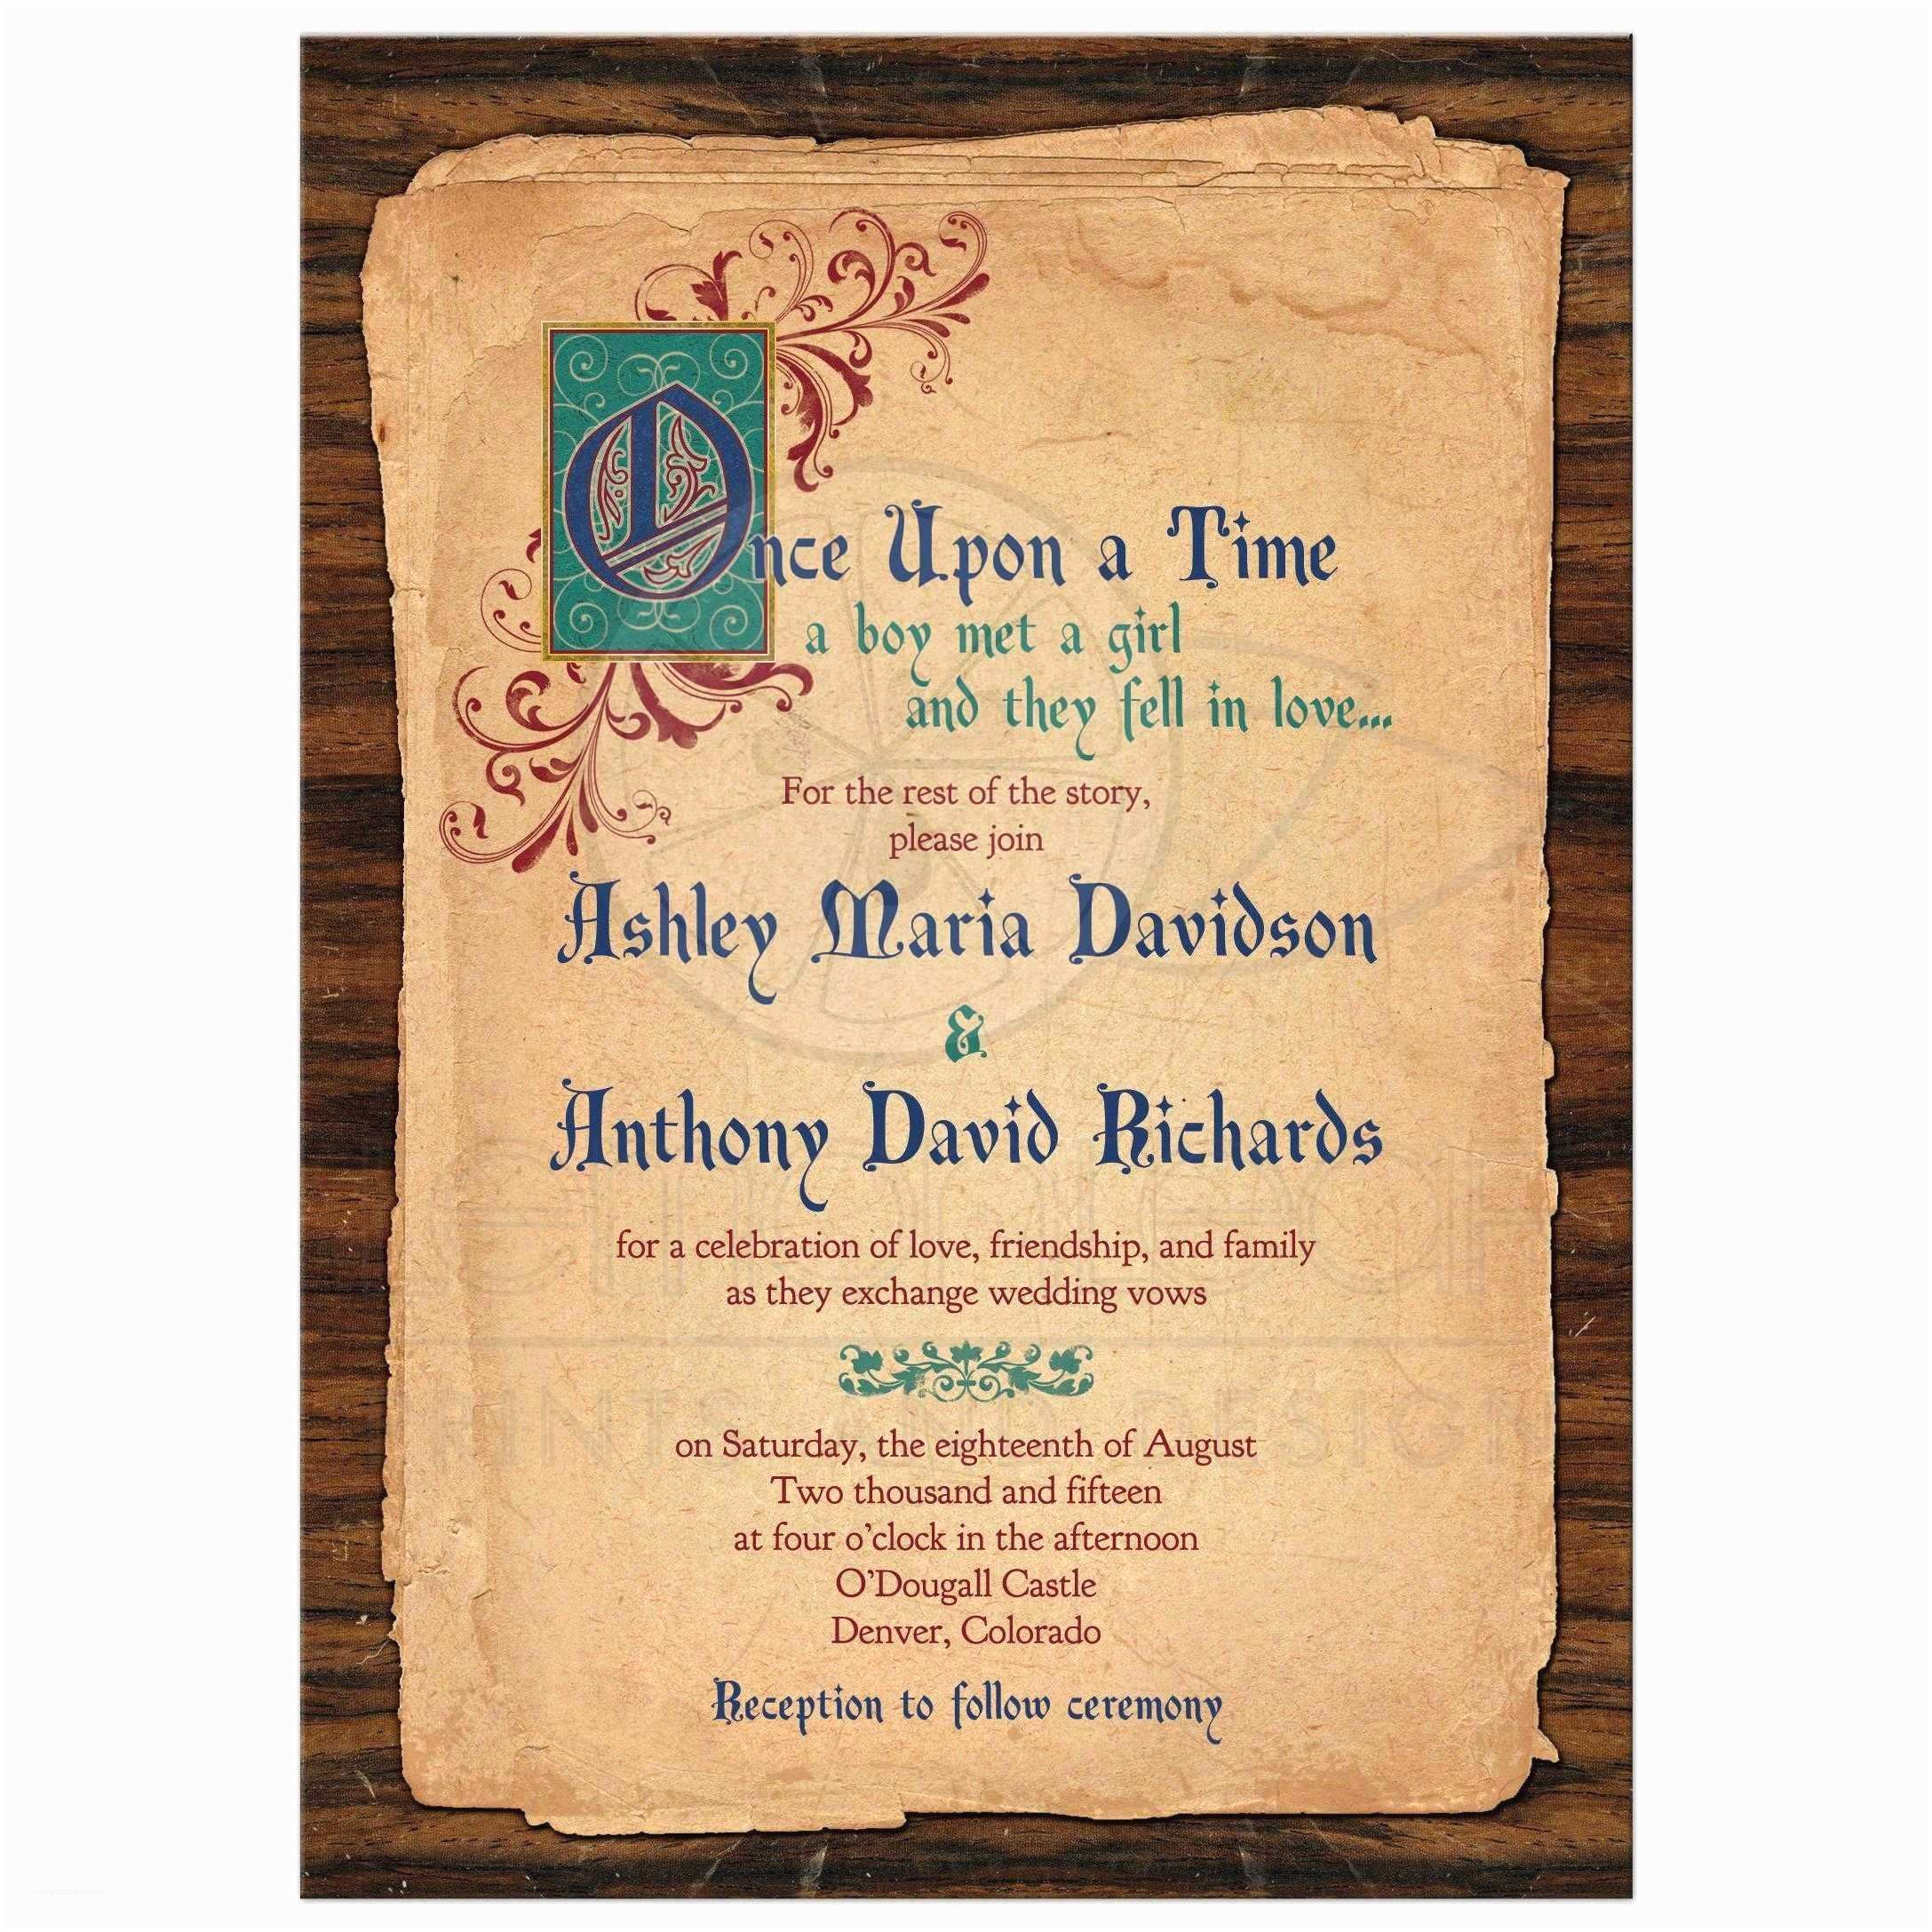 Fairytale Wedding Invitations Fairy Tale Wedding Invitation Me Val Ce Upon A Time